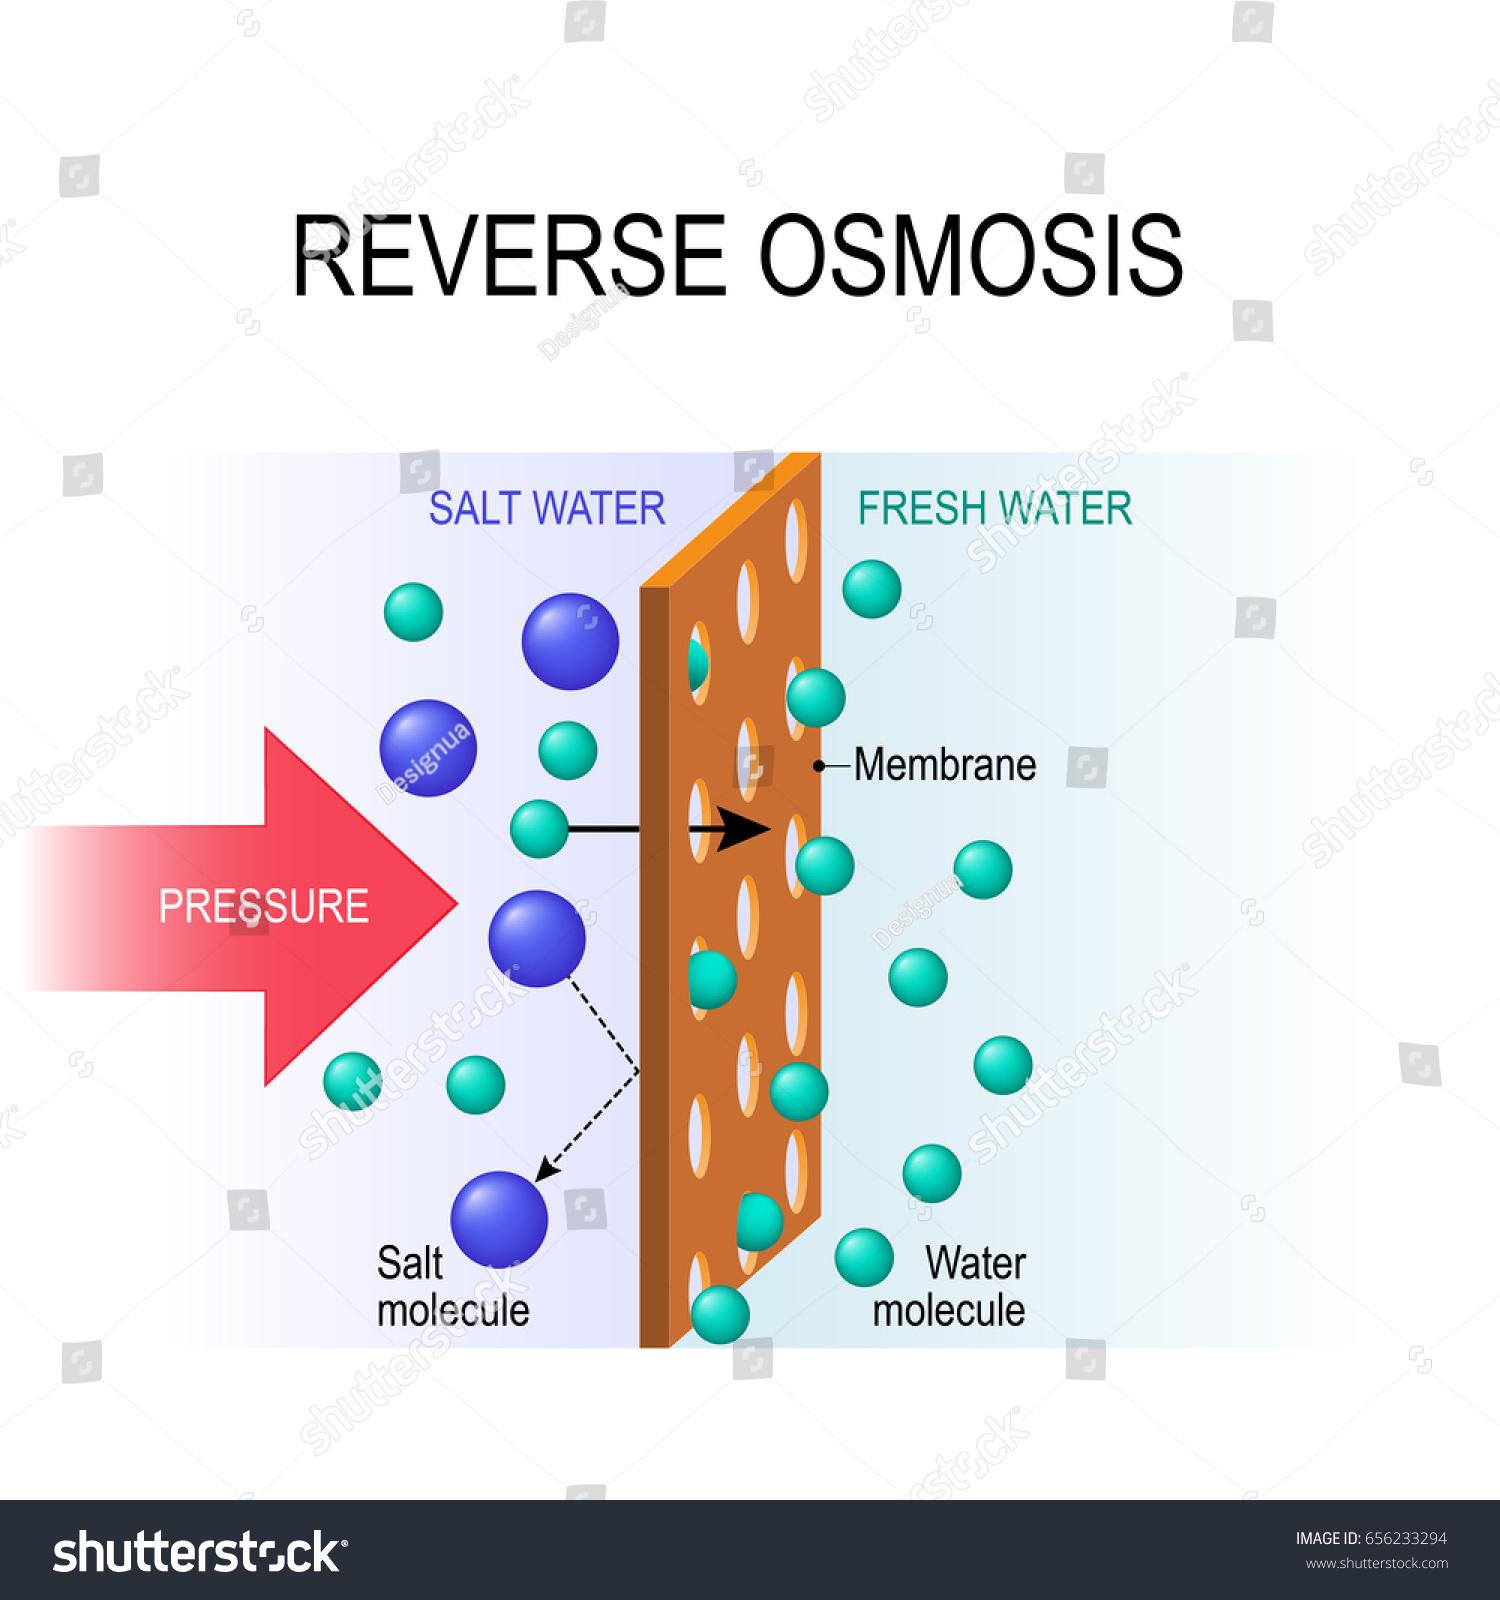 Reverse Osmosis Desalination Pressure Water Molecules Stock Vector